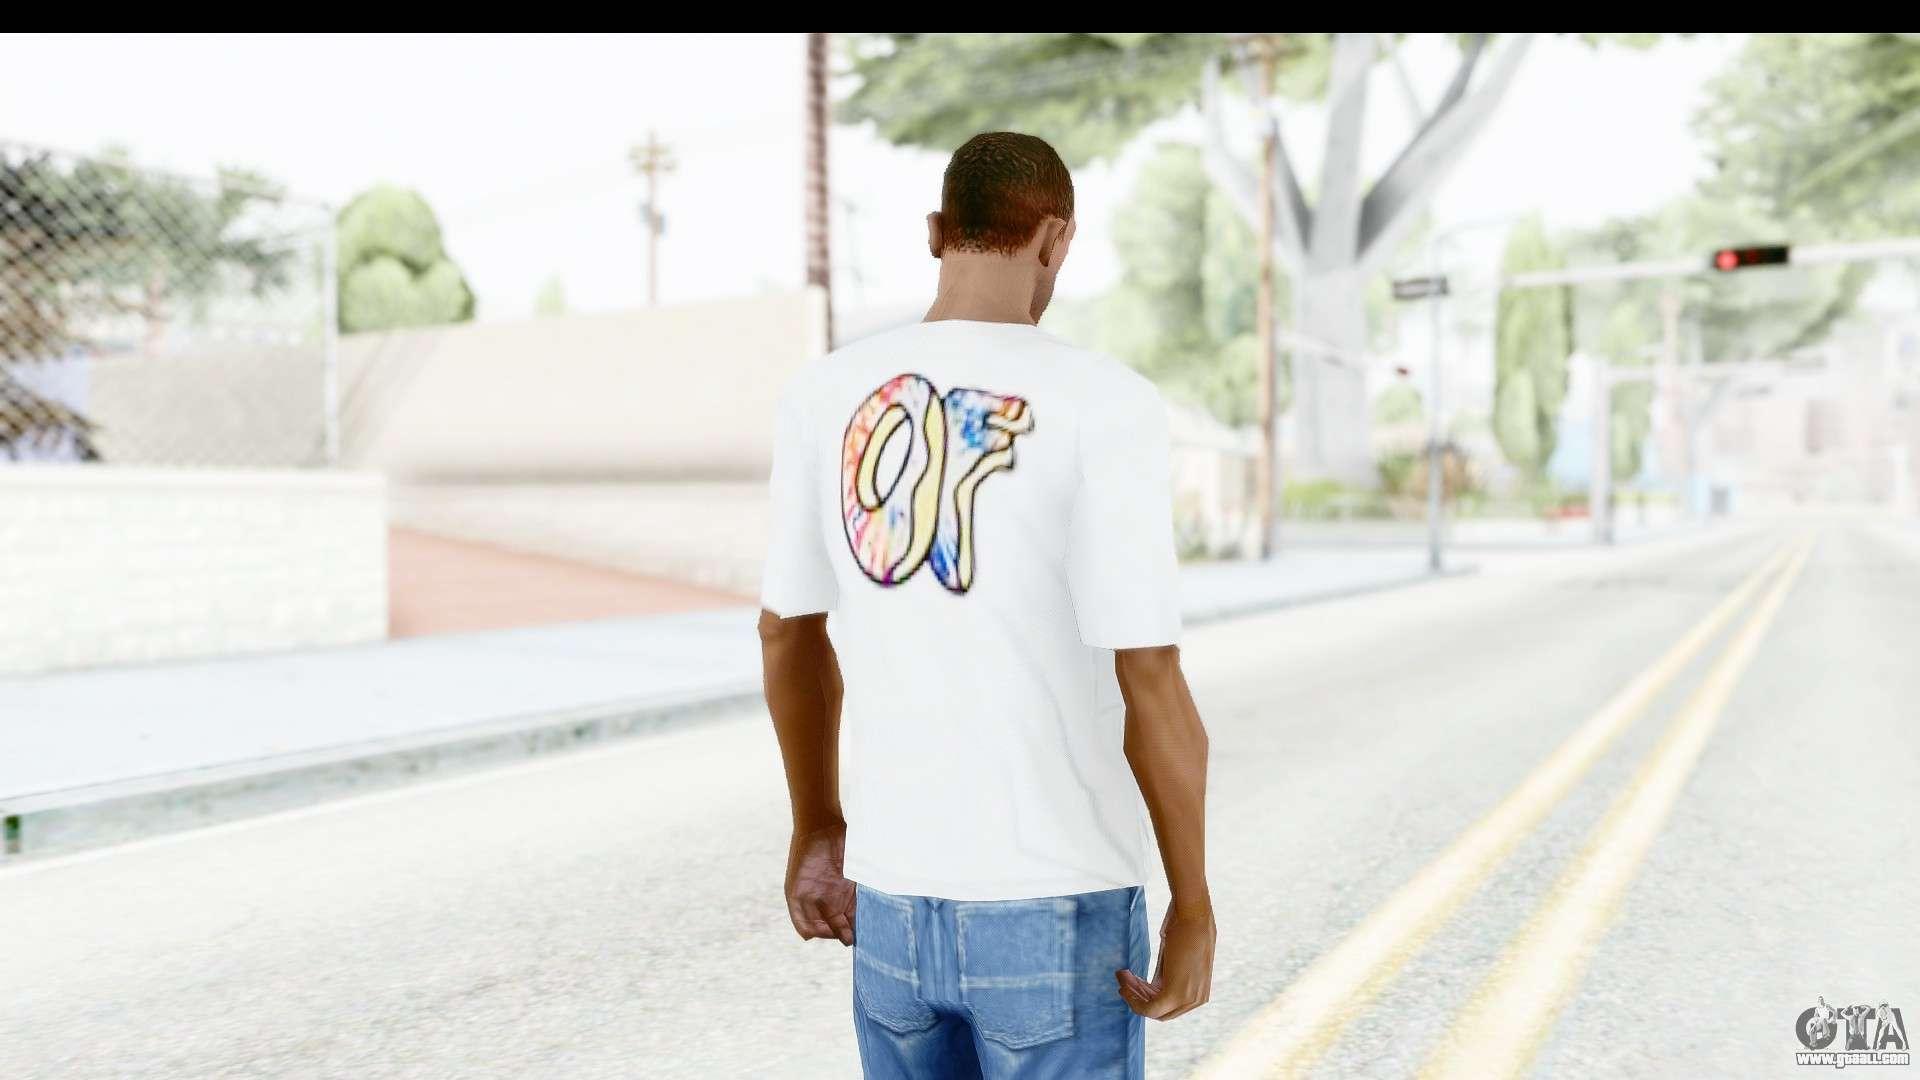 Of T Shirt For Gta San Andreas